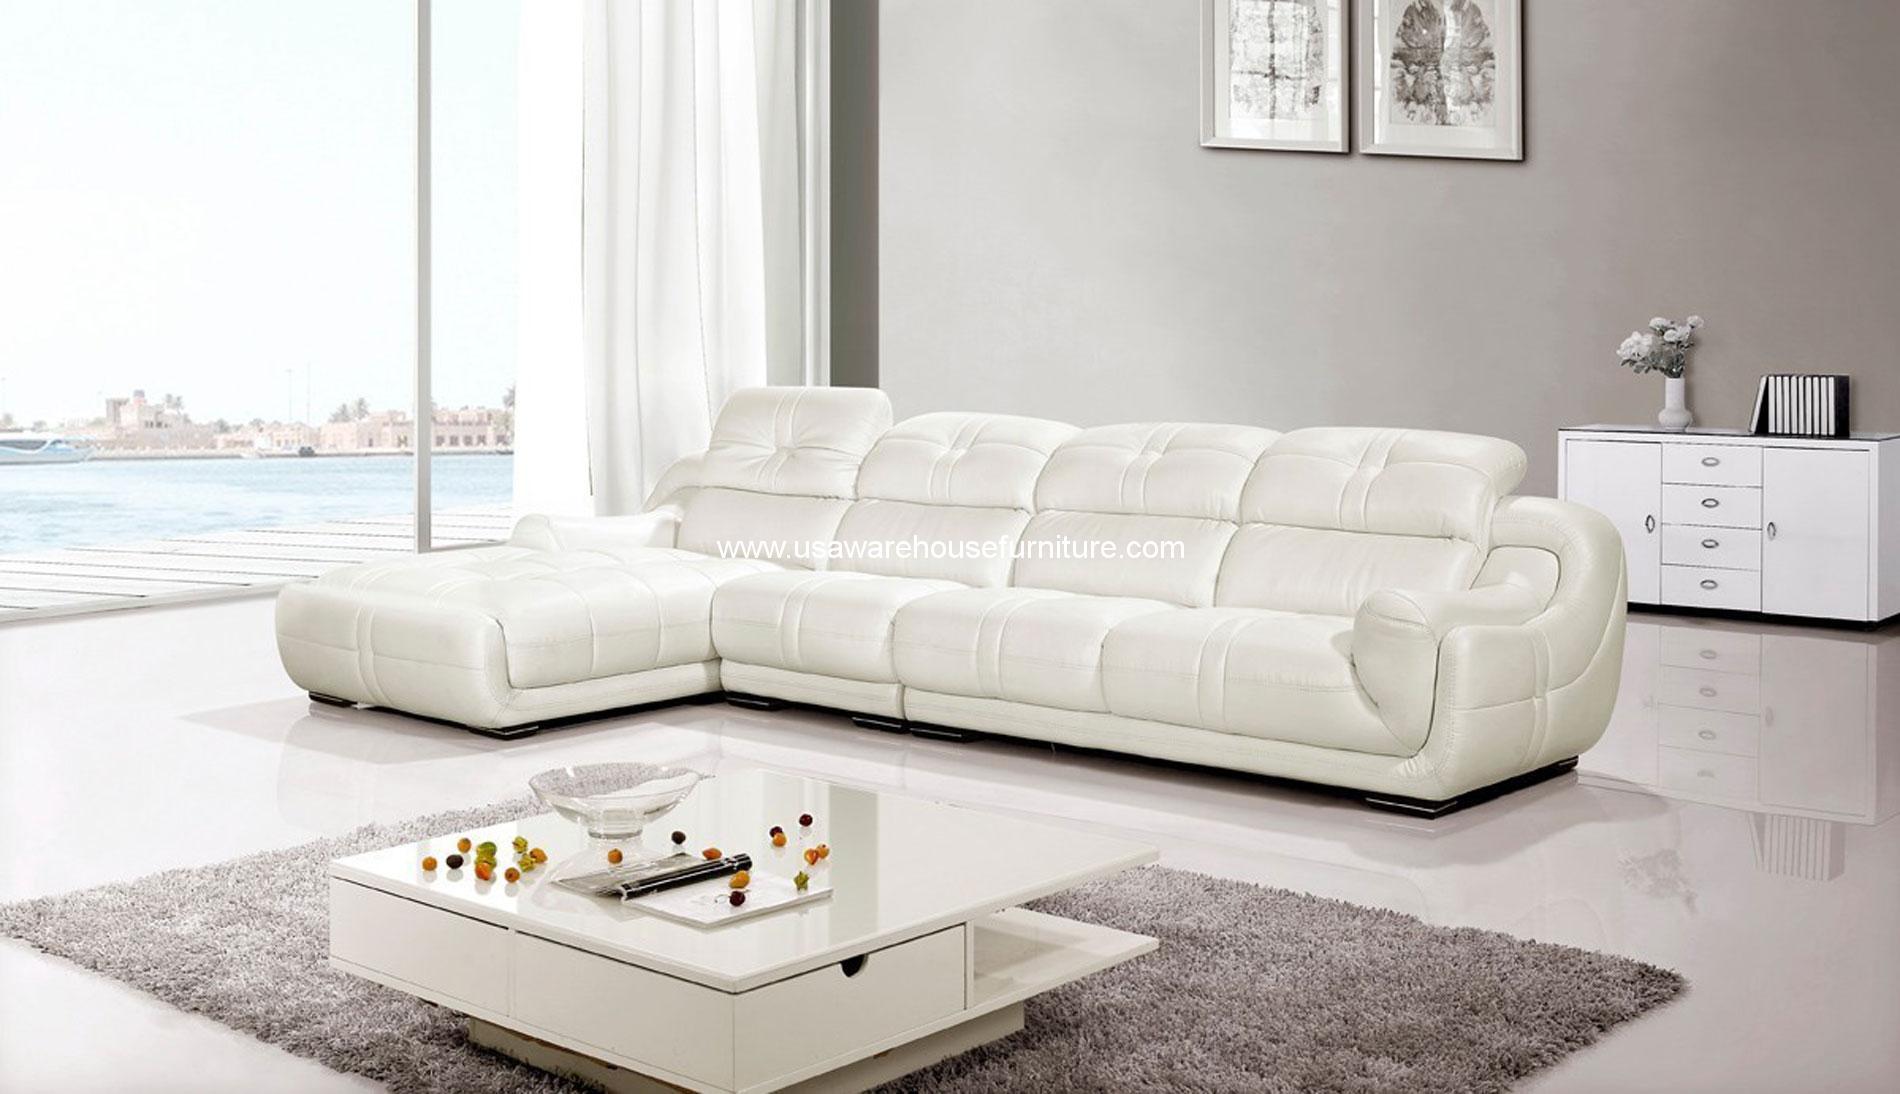 3 piece white leather sofa set s shaped brio genuine sectional w